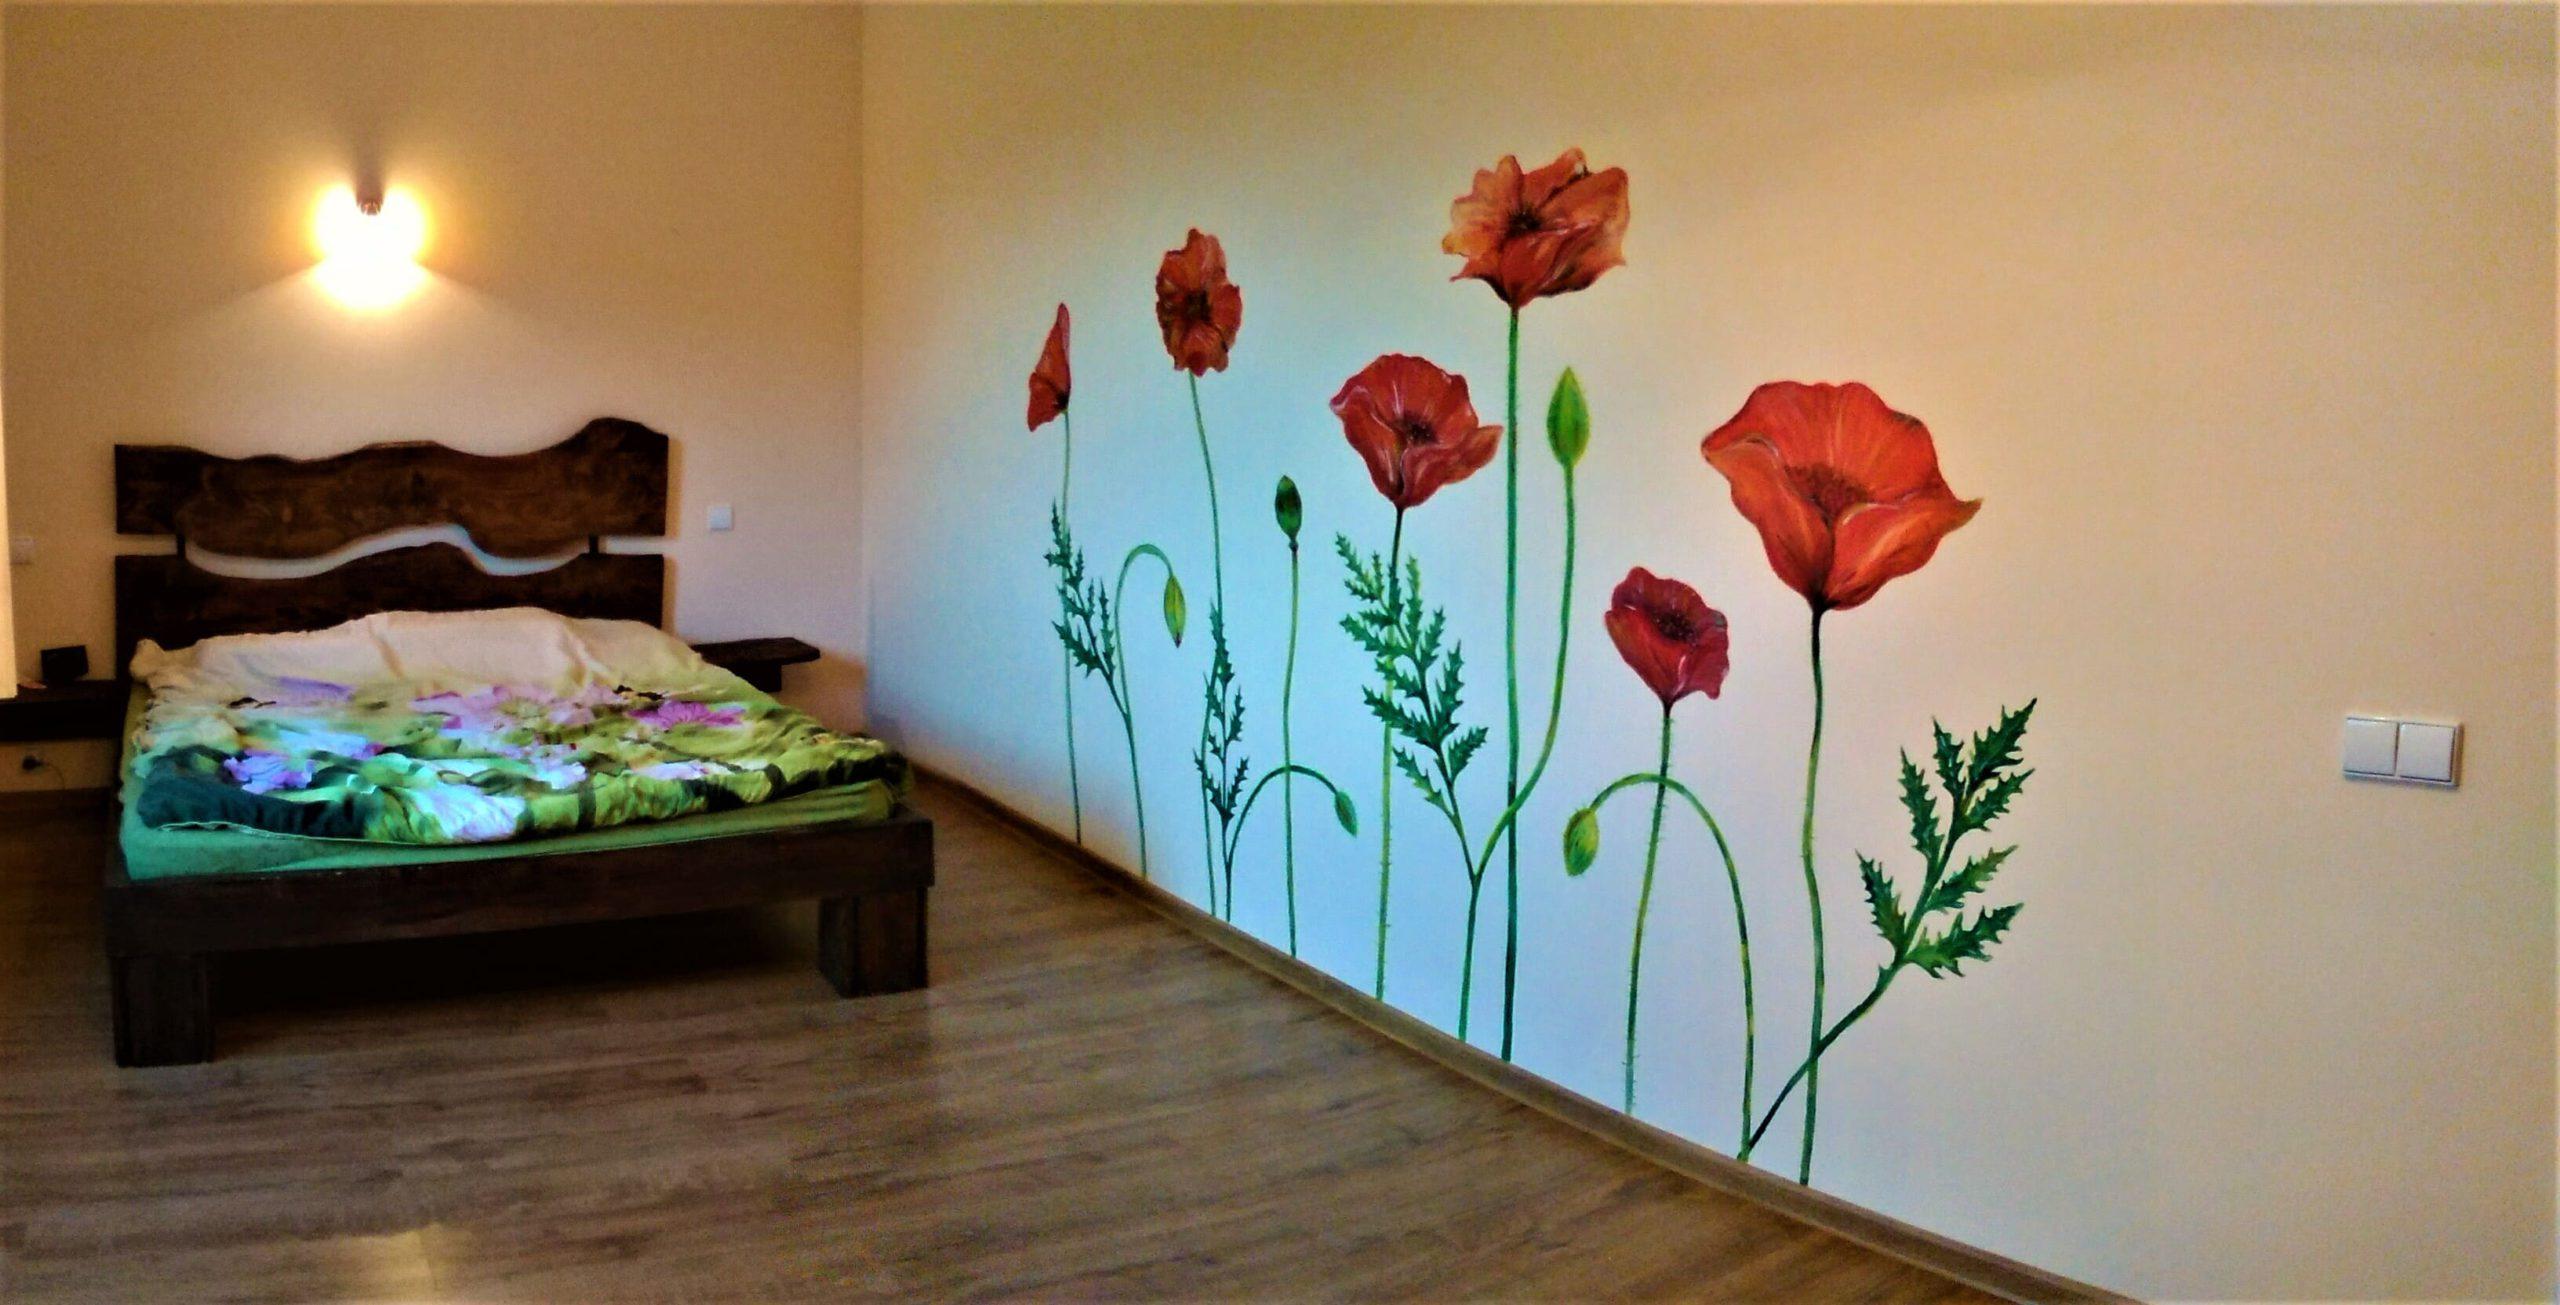 menine-kuryba-sienu-dekoravimas-ivairus-interjerai (48)